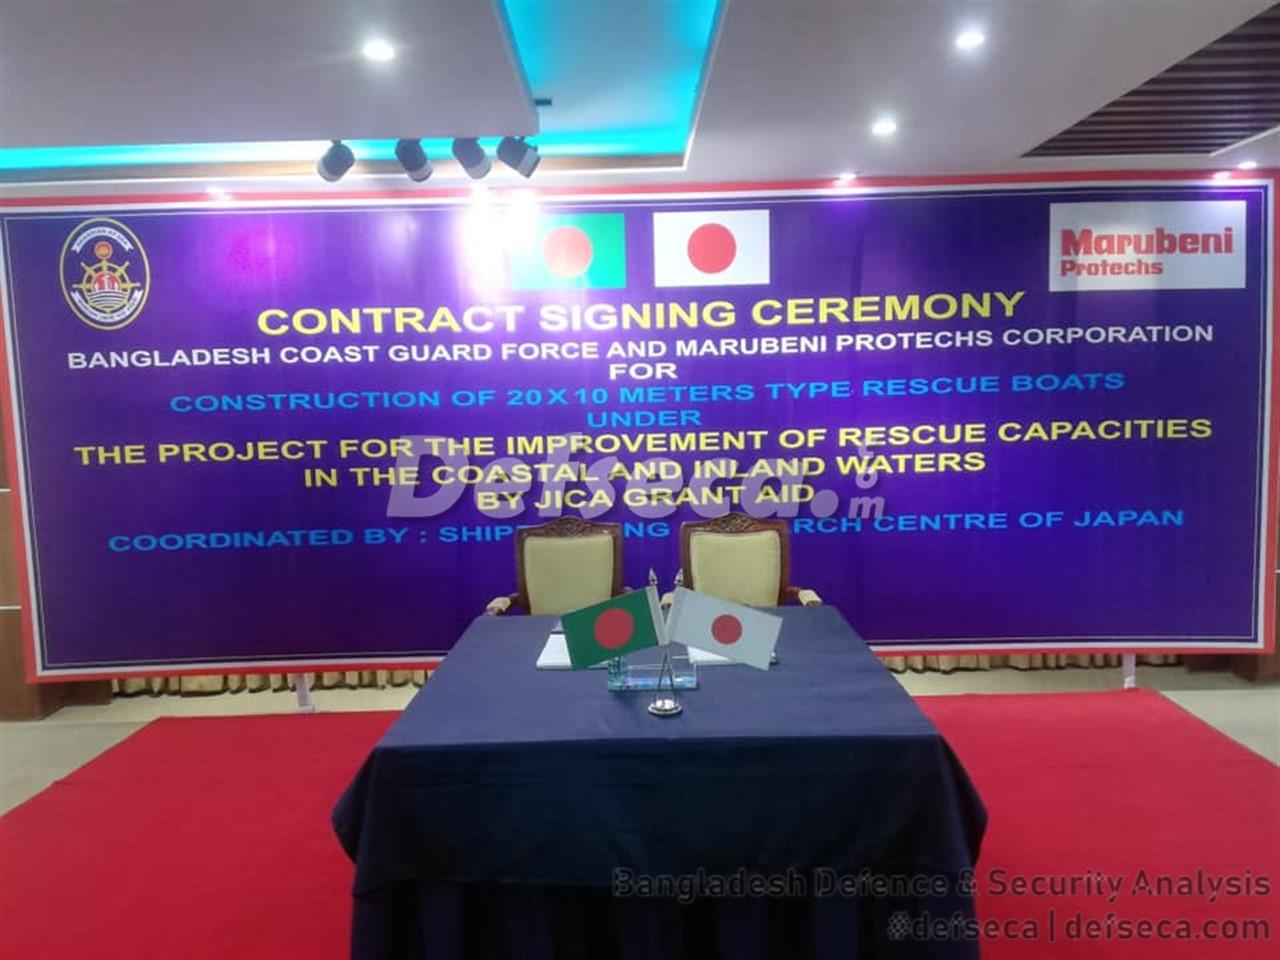 Japan grants 20 rescue boats for Bangladesh Coast Guard